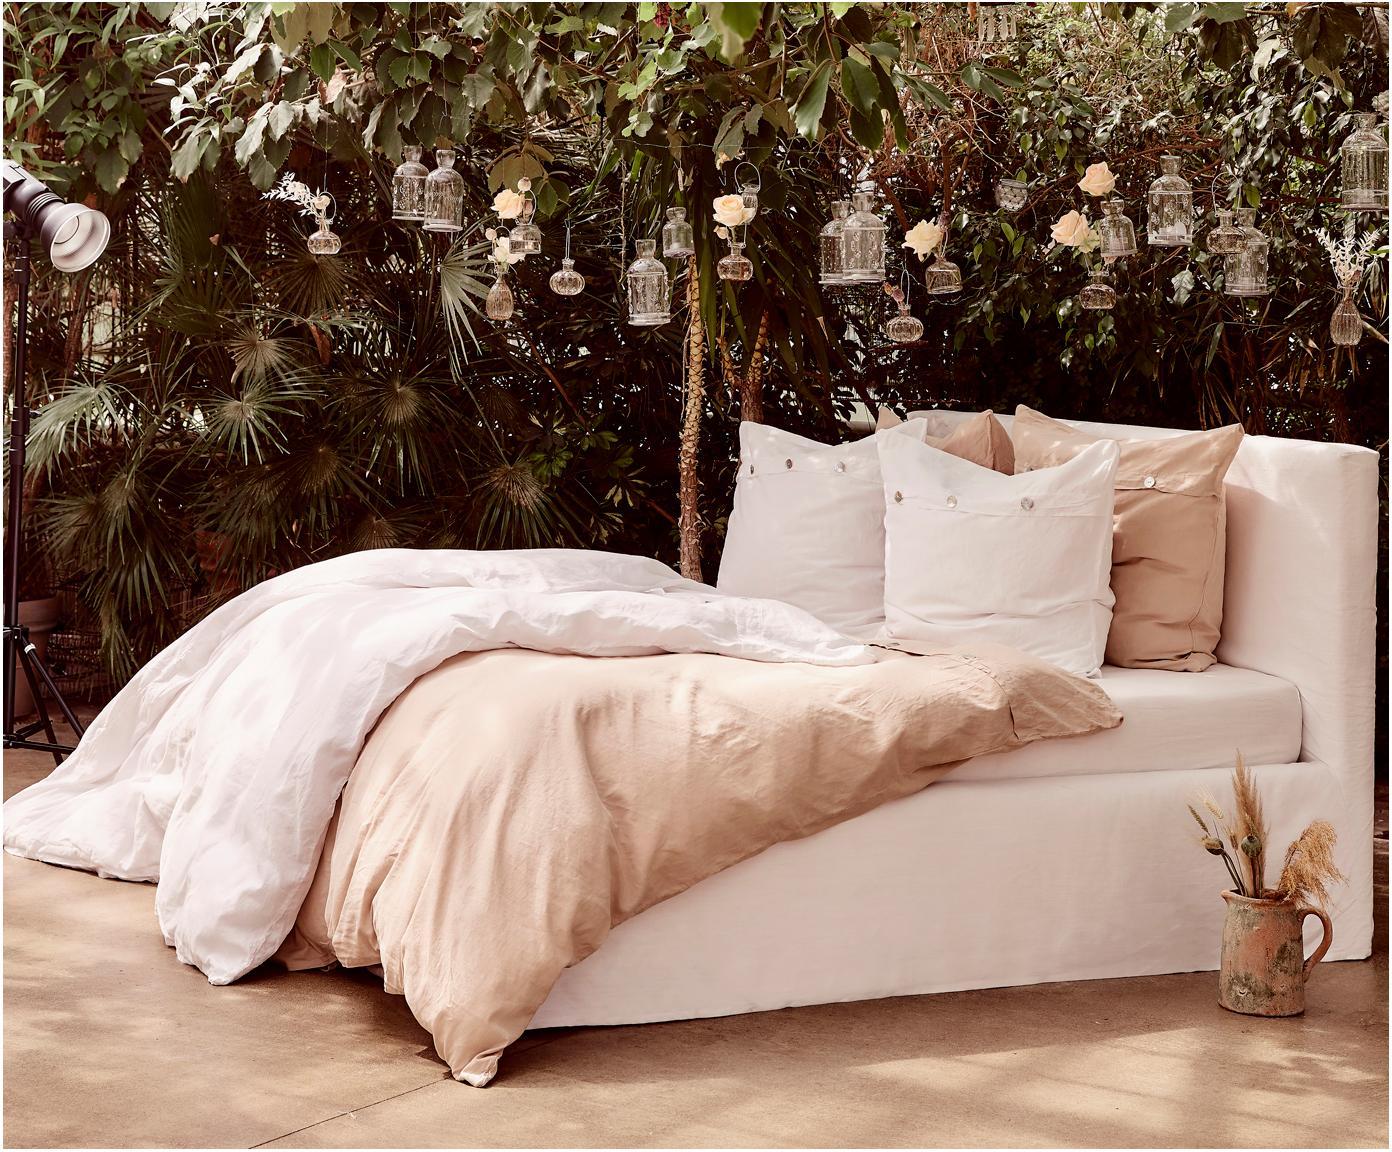 Gestoffeerd bed Feather met opbergfunctie, Frame: massief grenenhout, Bekleding: polyester (structuurmater, Crèmewit, 180 x 200 cm